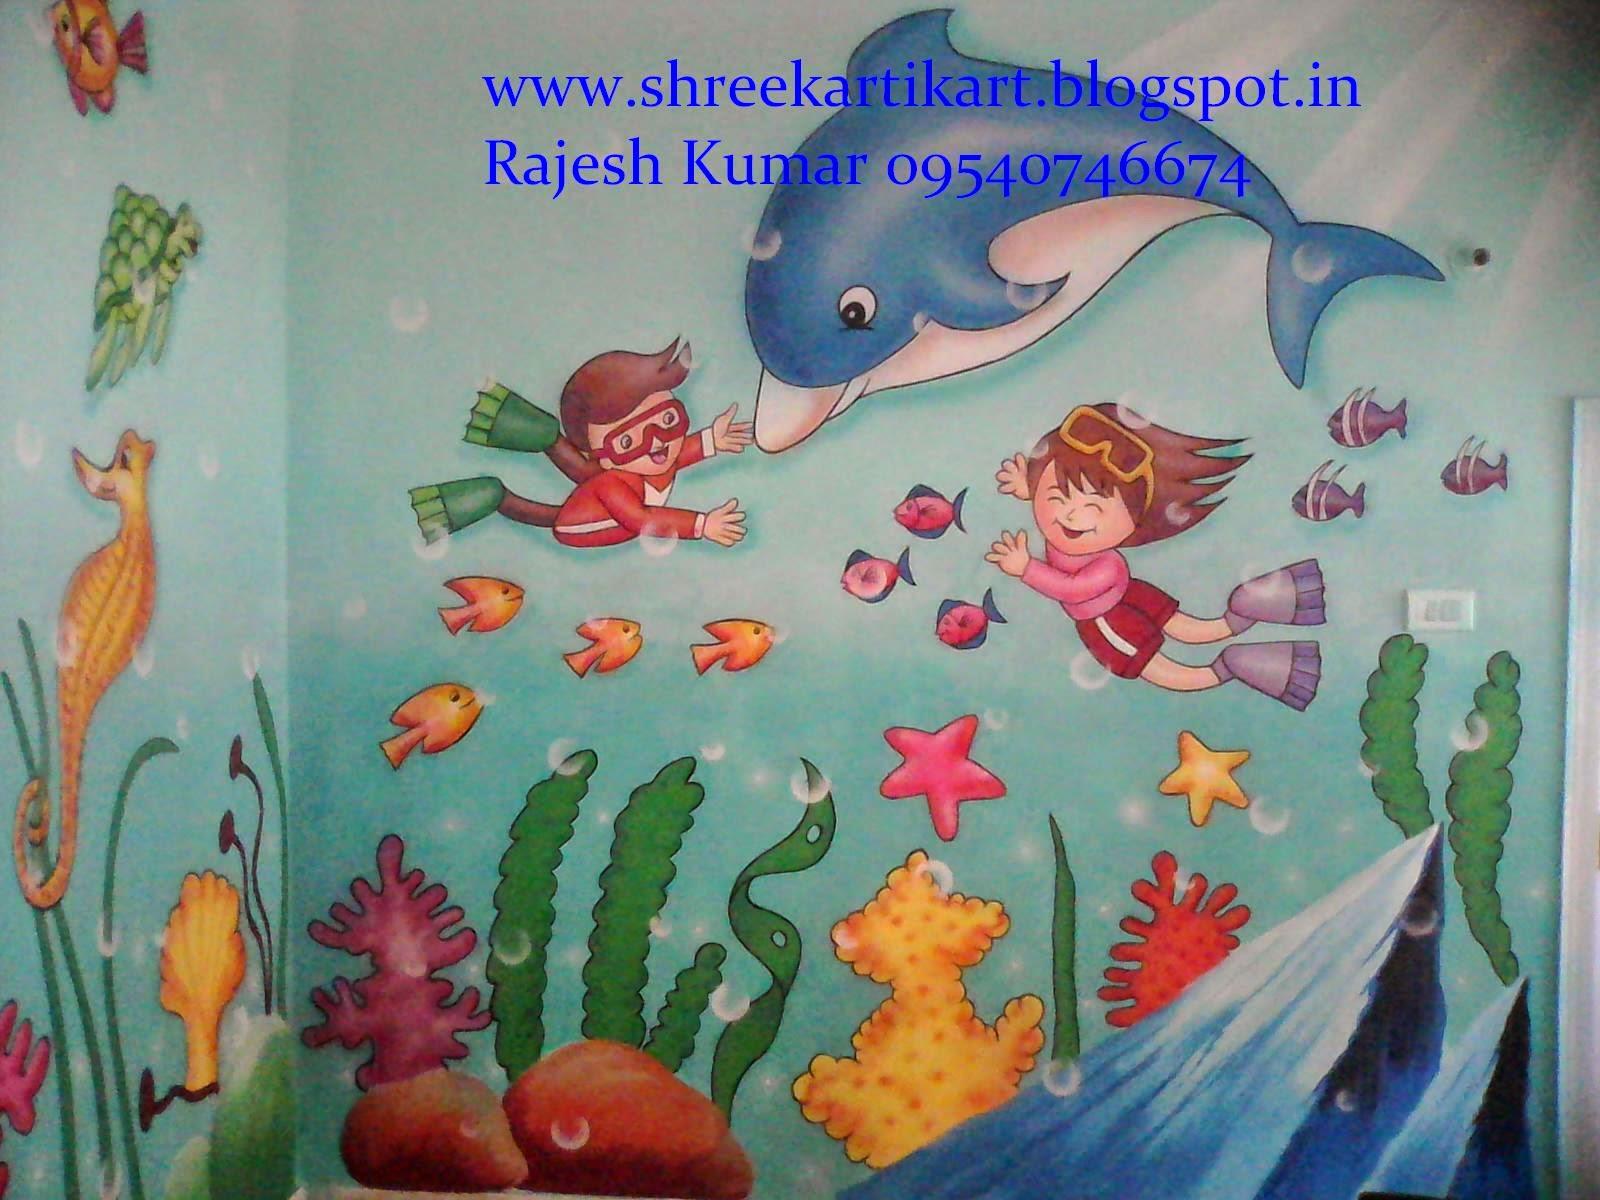 Play School Wall Painting 3d Cartoon Painting School